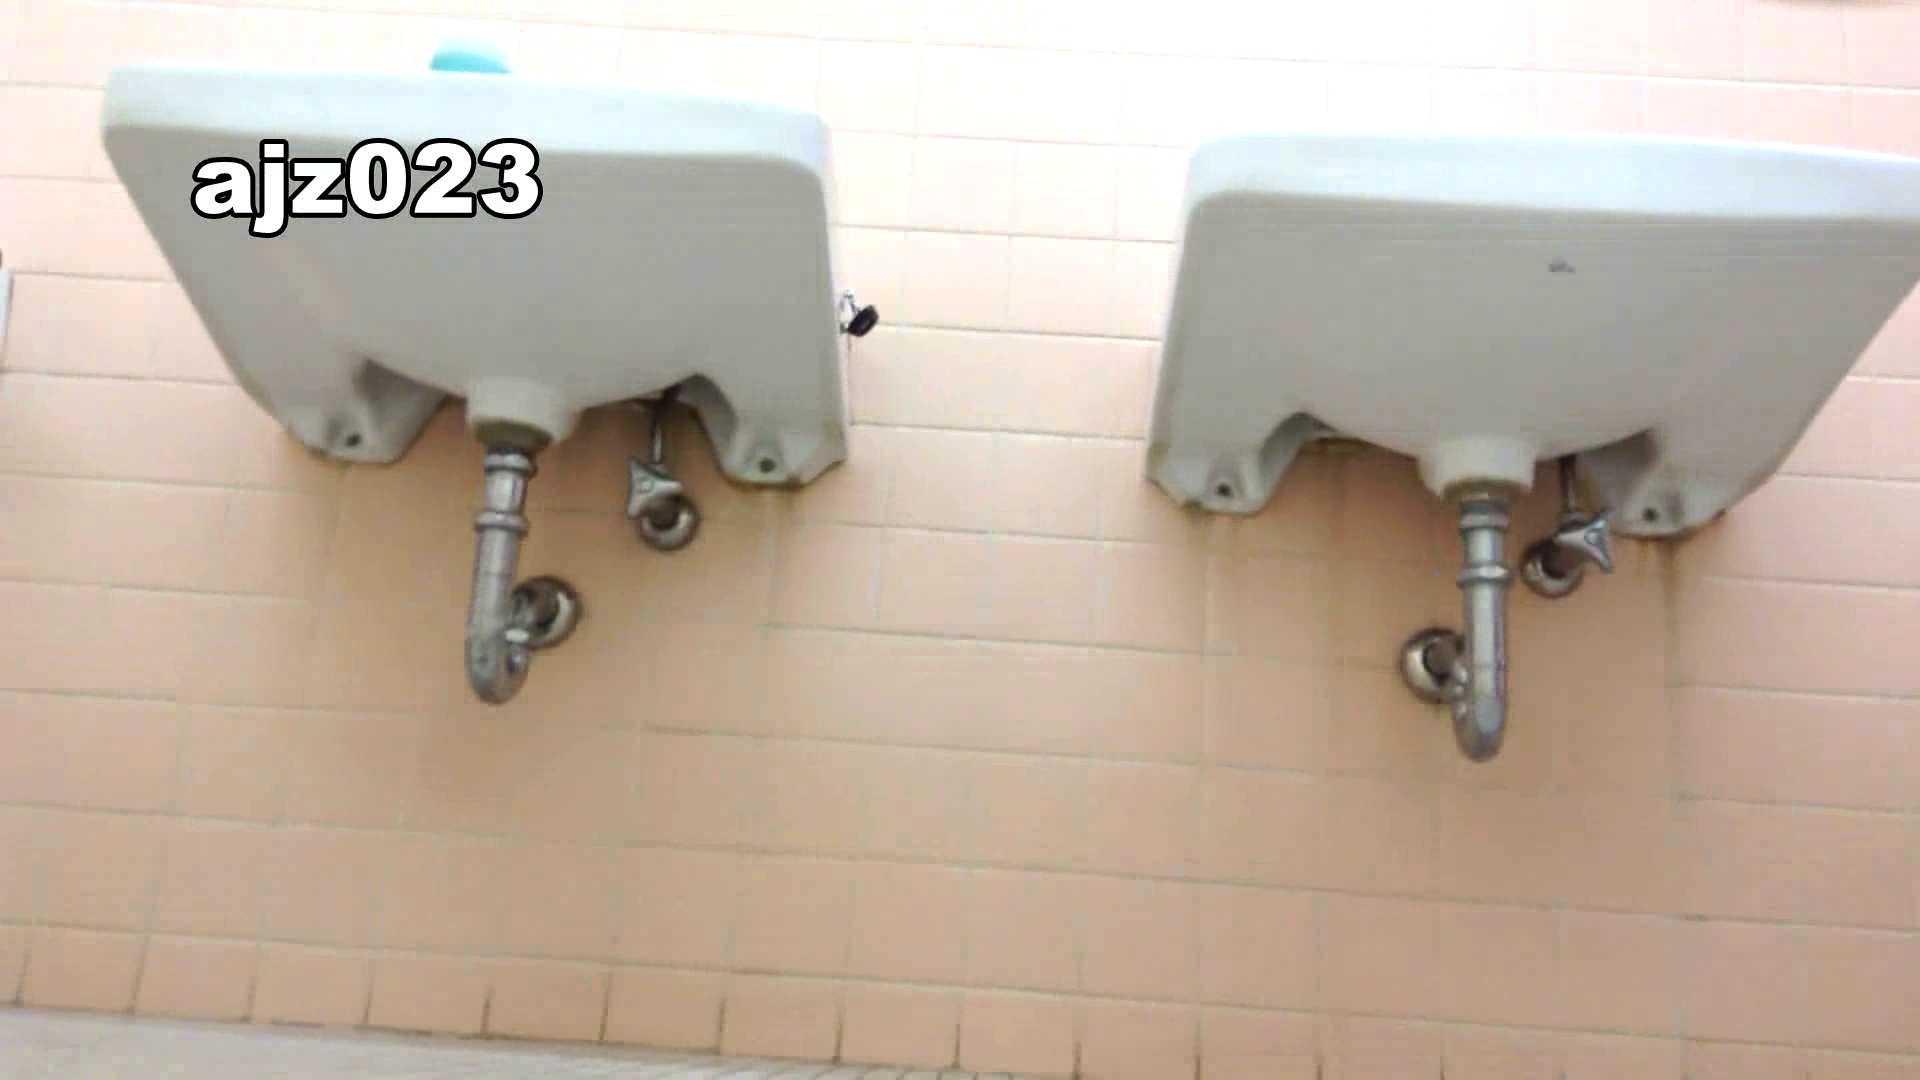 某有名大学女性洗面所 vol.23 洗面所 隠し撮りオマンコ動画紹介 101画像 63